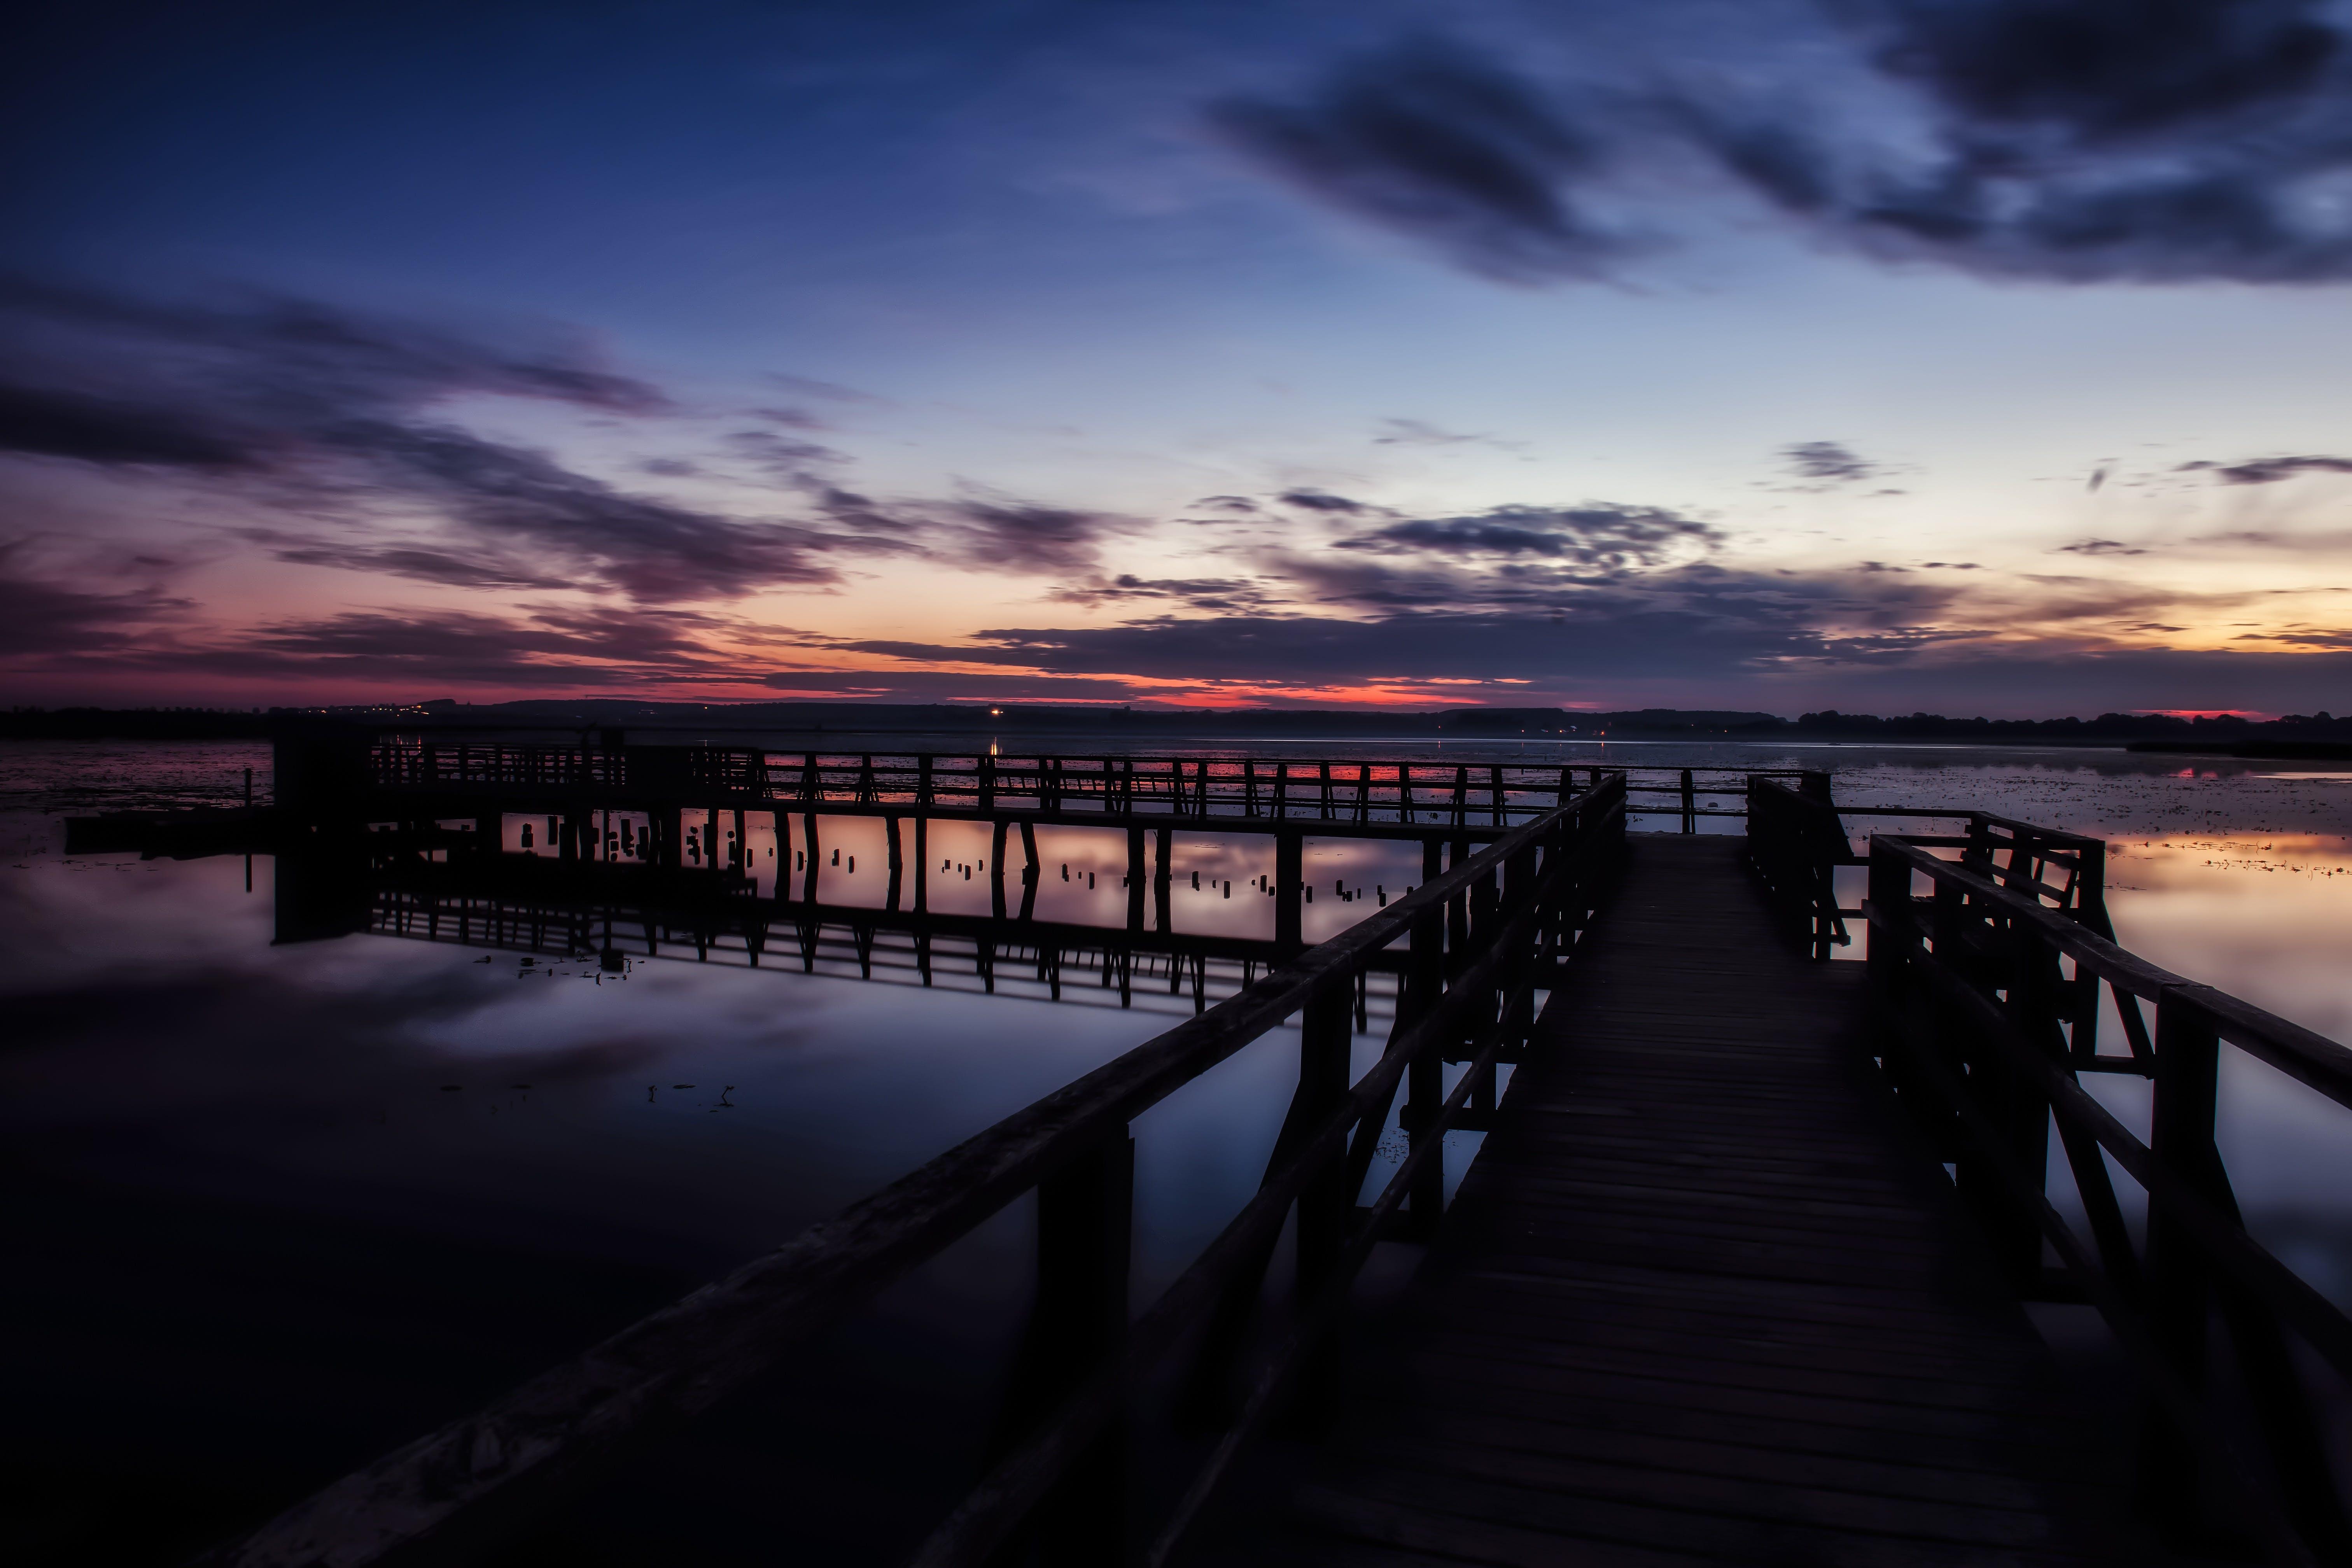 beach, bridge, calm waters